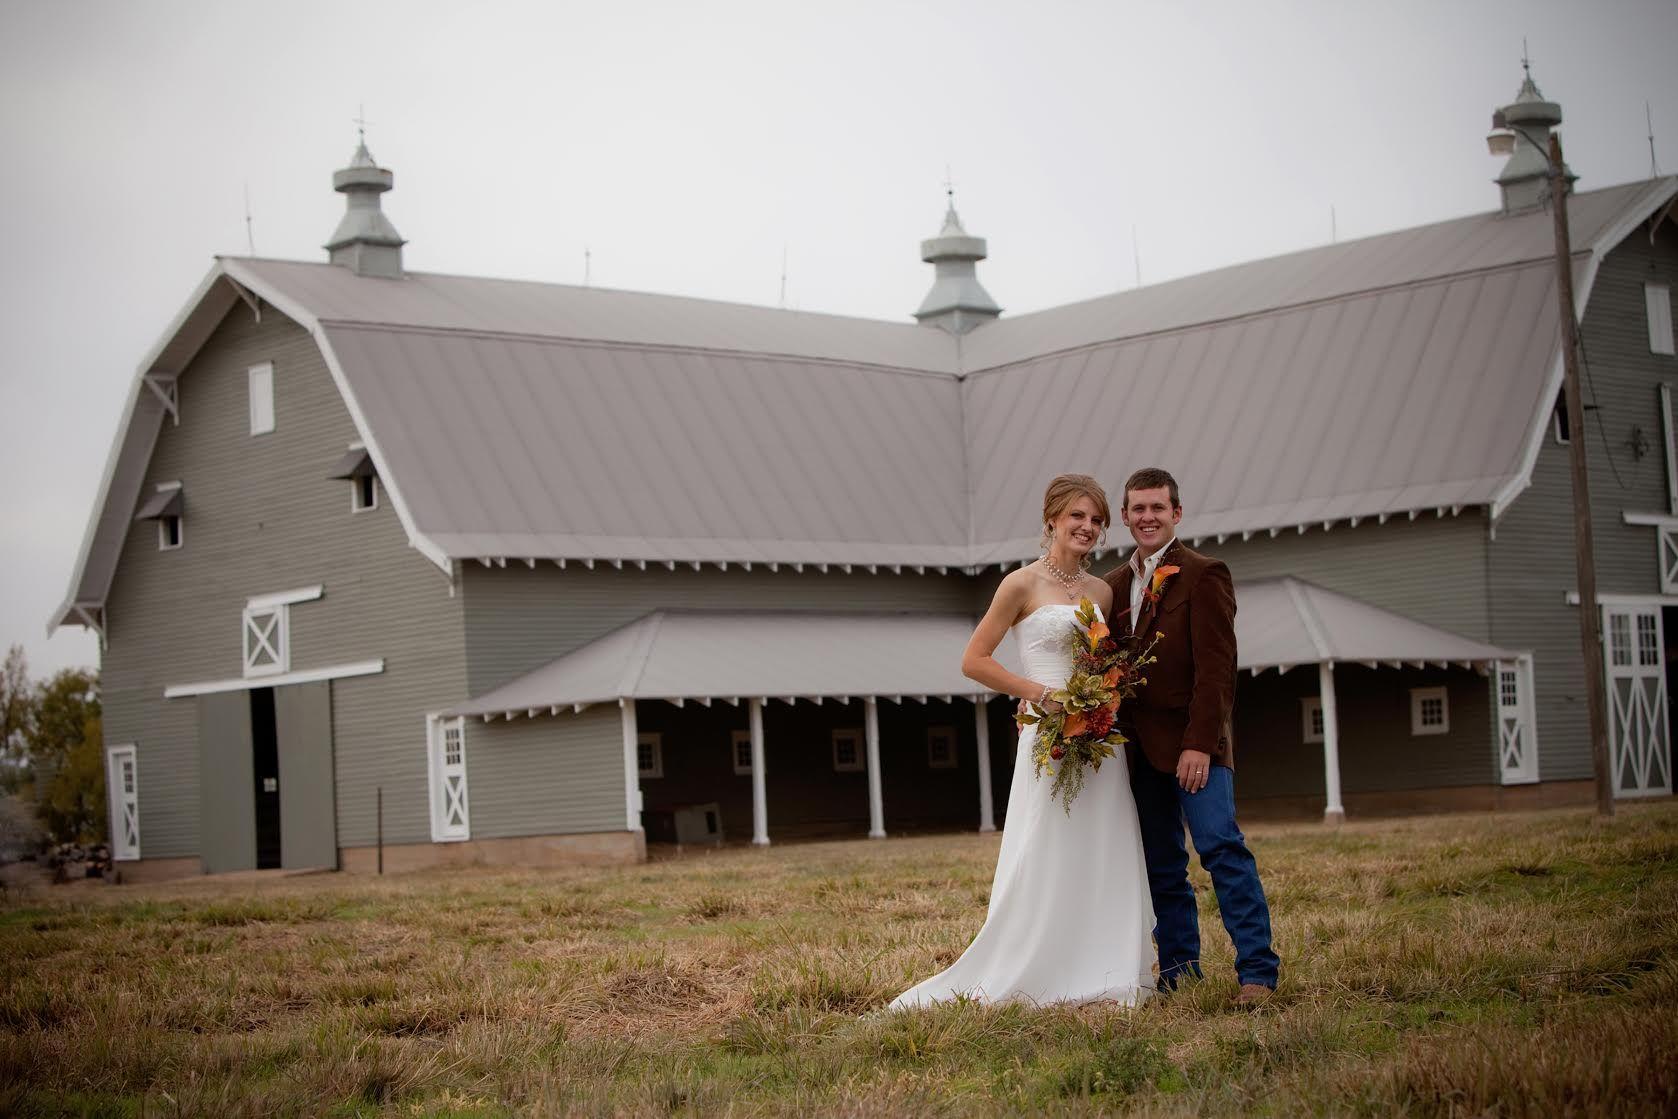 Collingwood Barn Kansas Profile